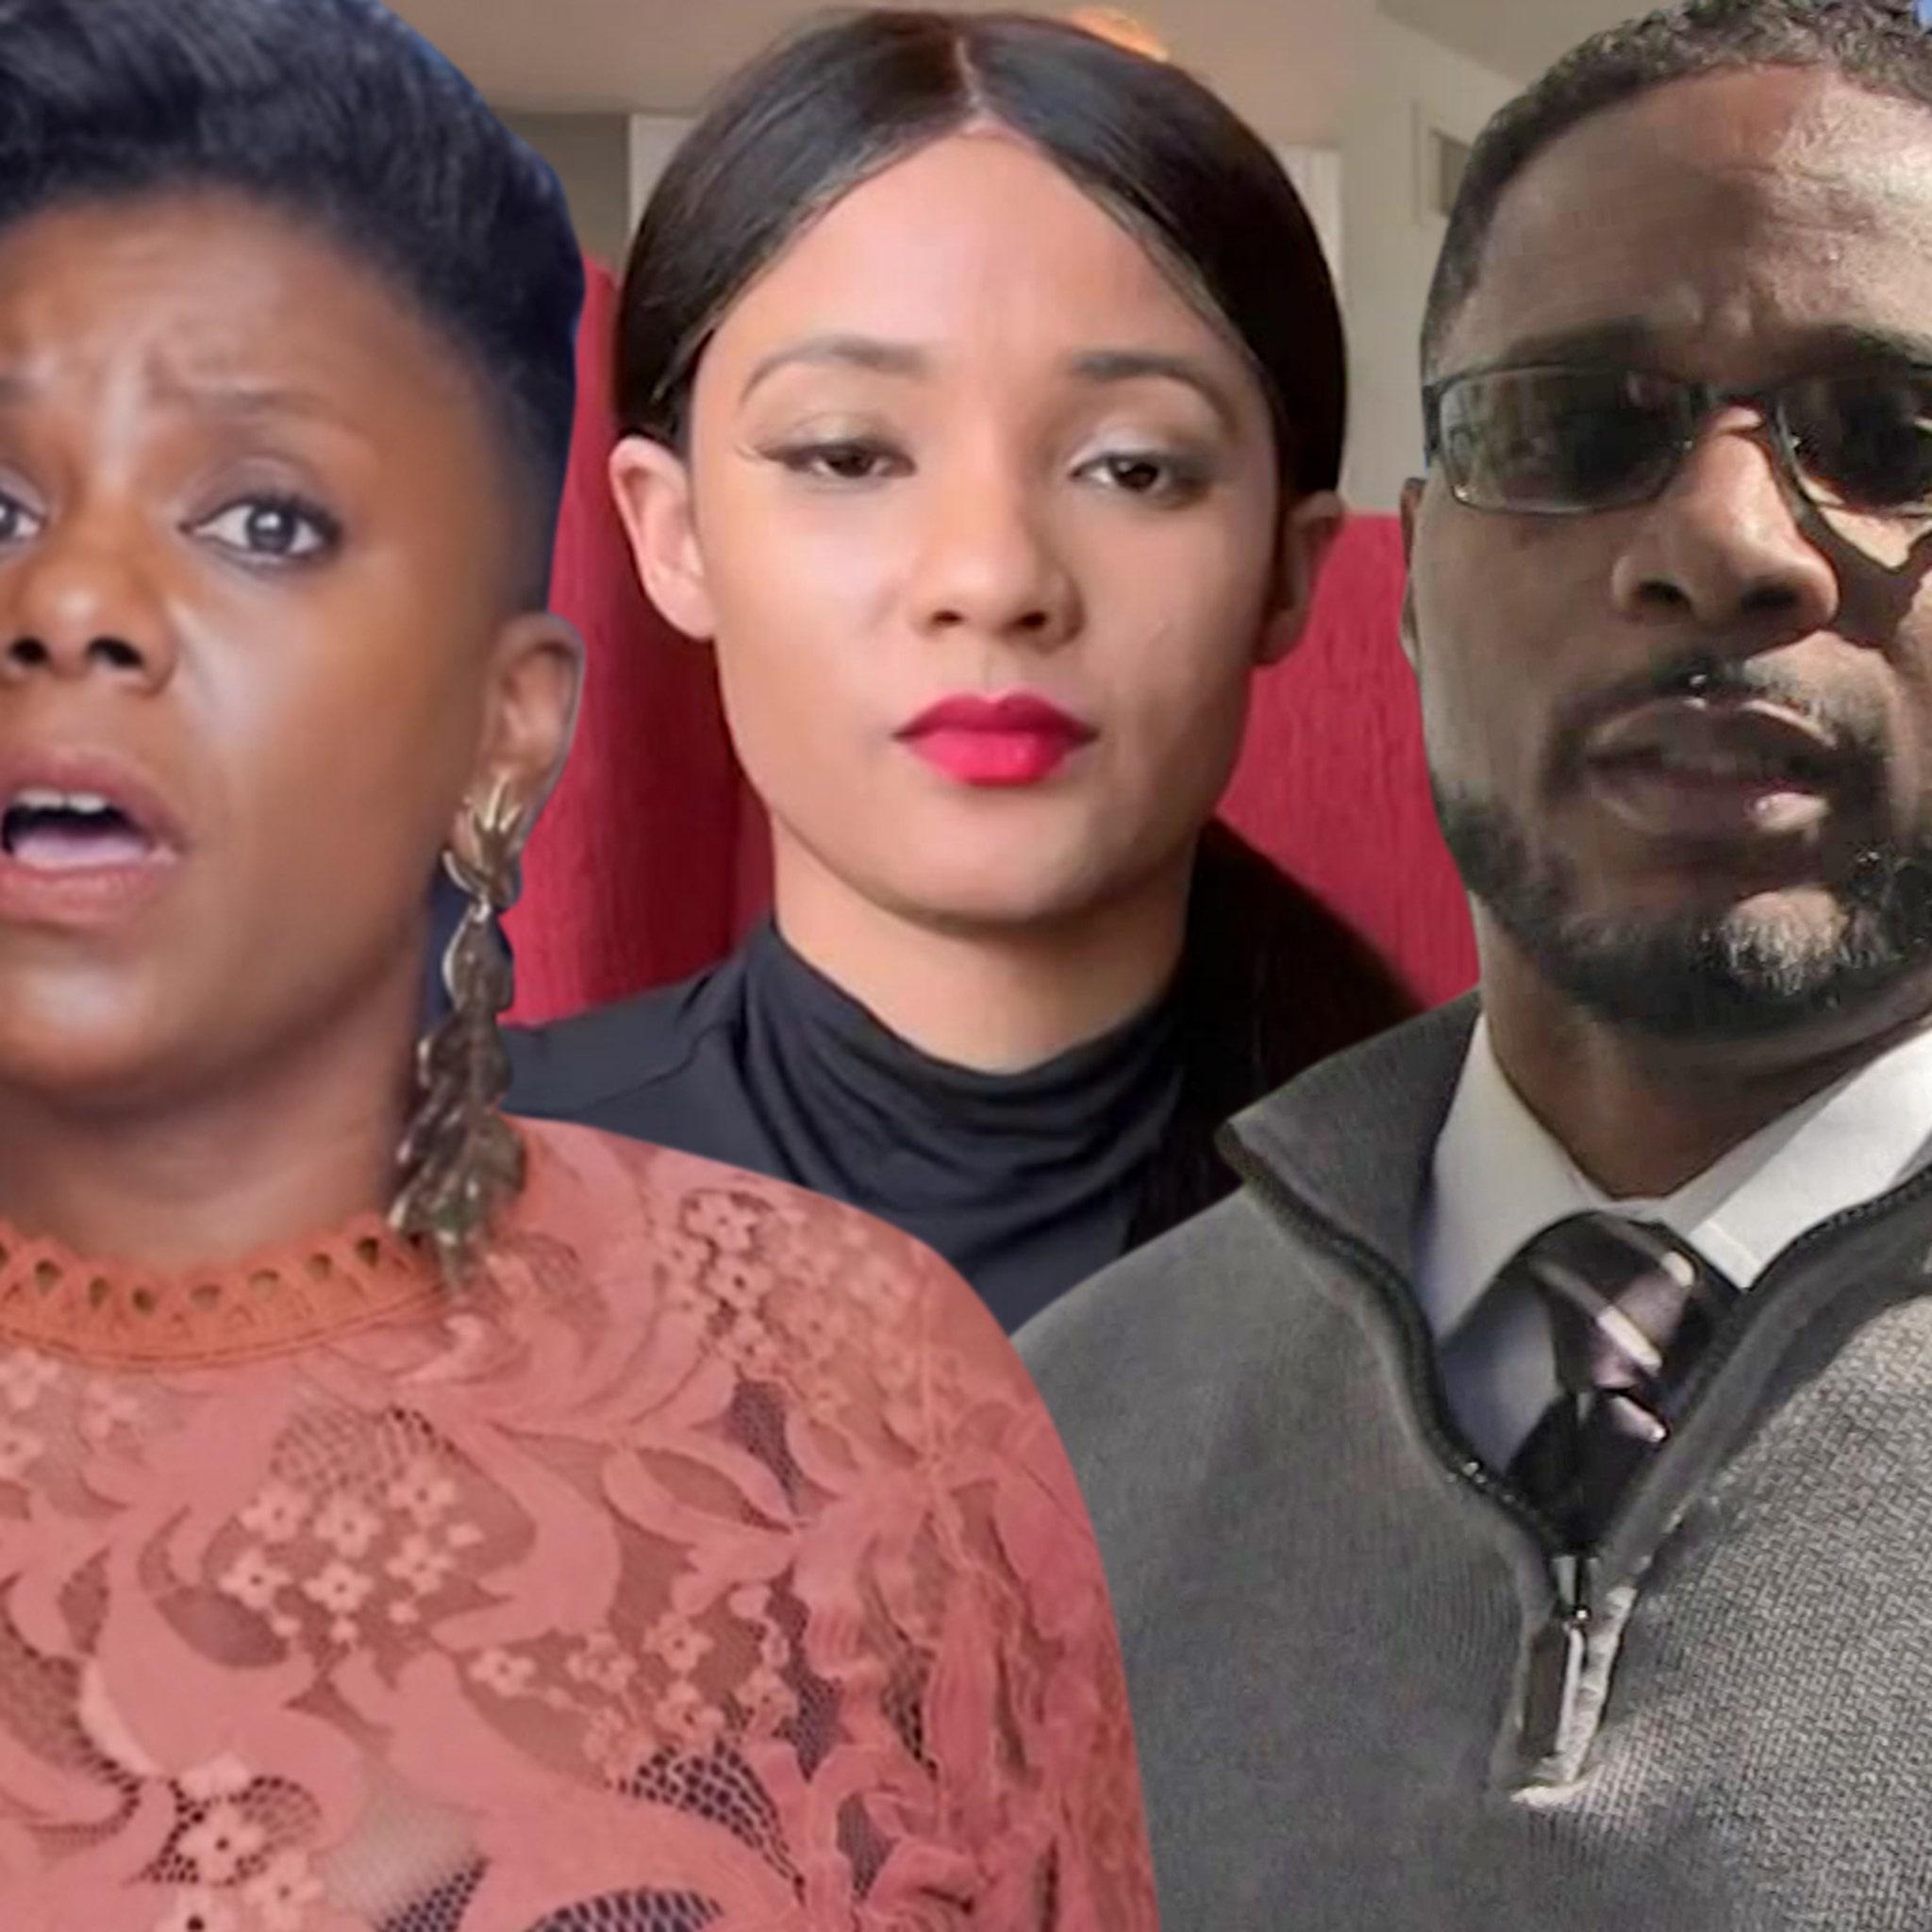 Joycelyn Savage's Parents Threaten to Sue Blogger Tasha K for Defamation